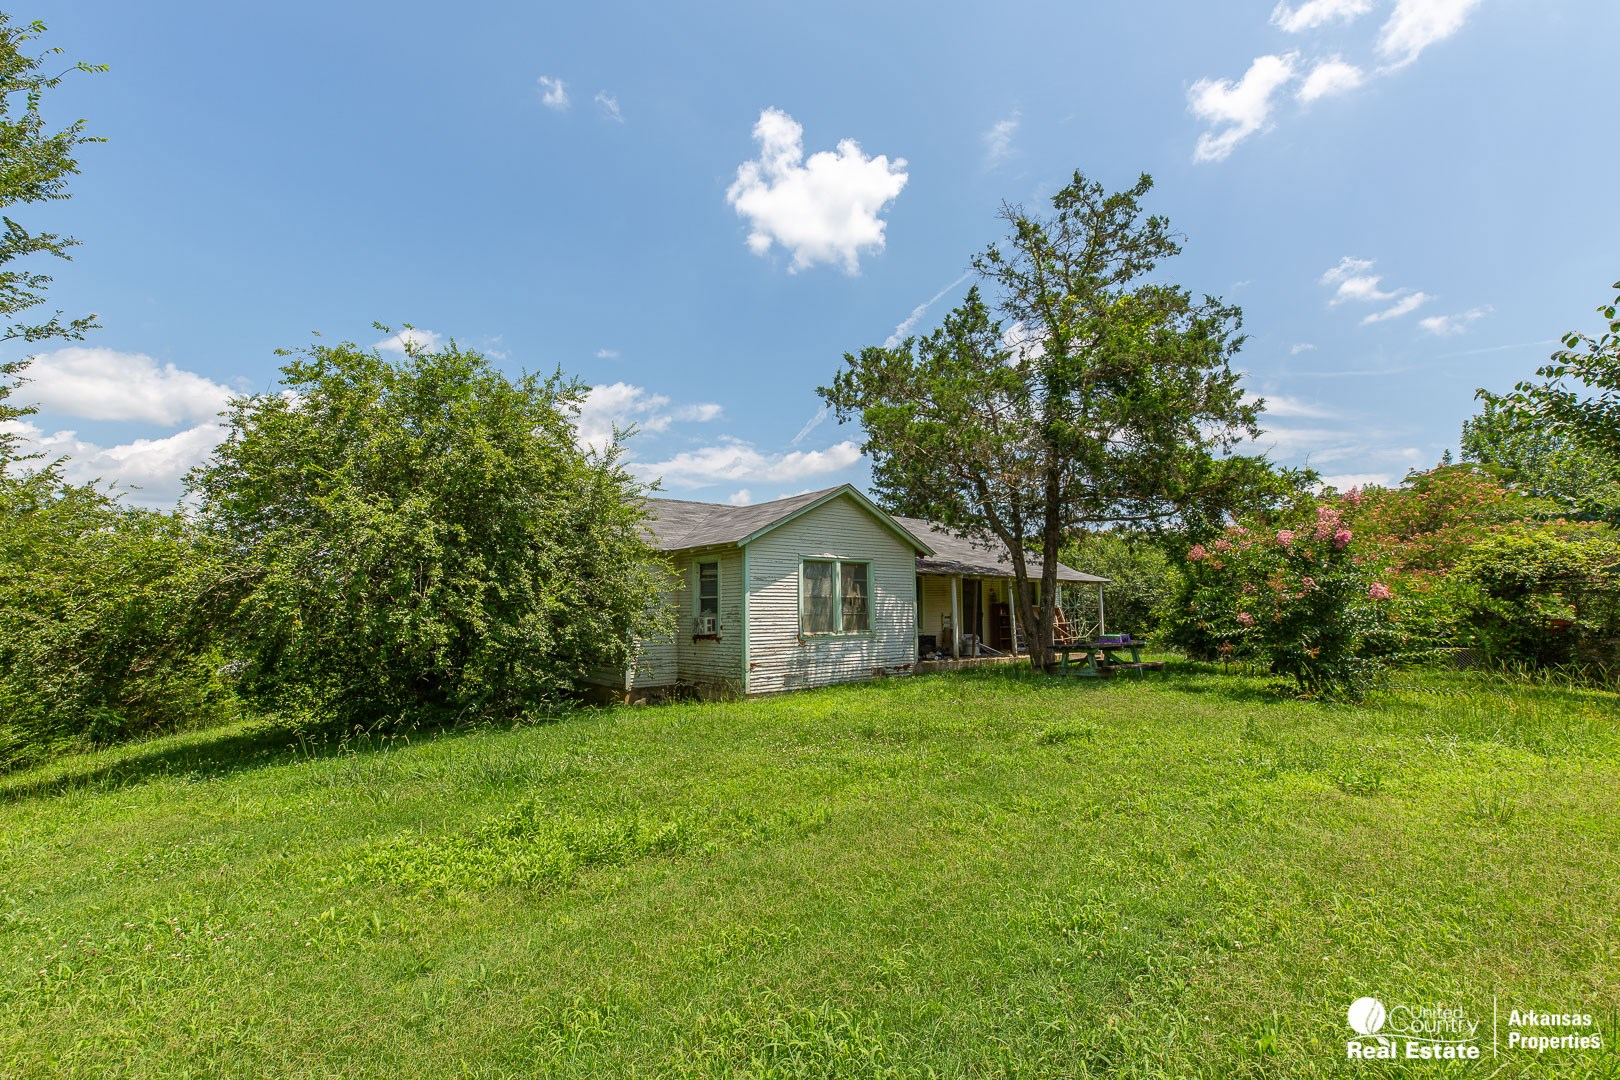 Old Farm for Sale in Arkansas